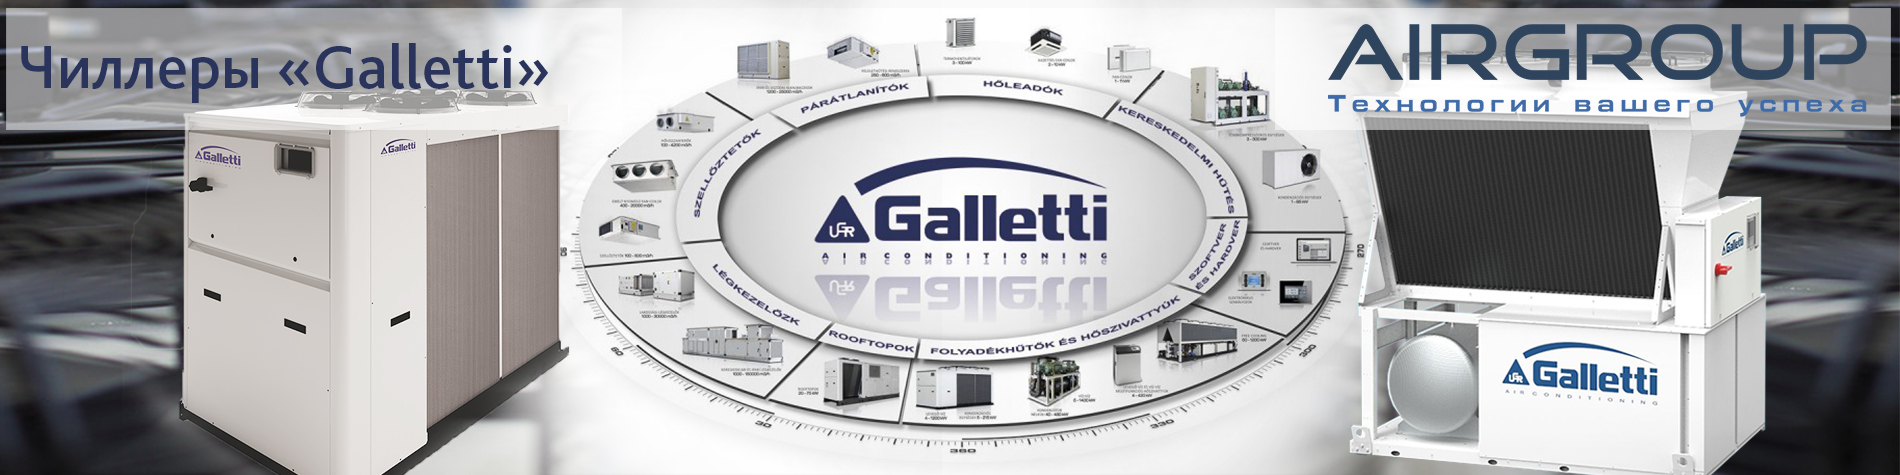 Galetti.jpg